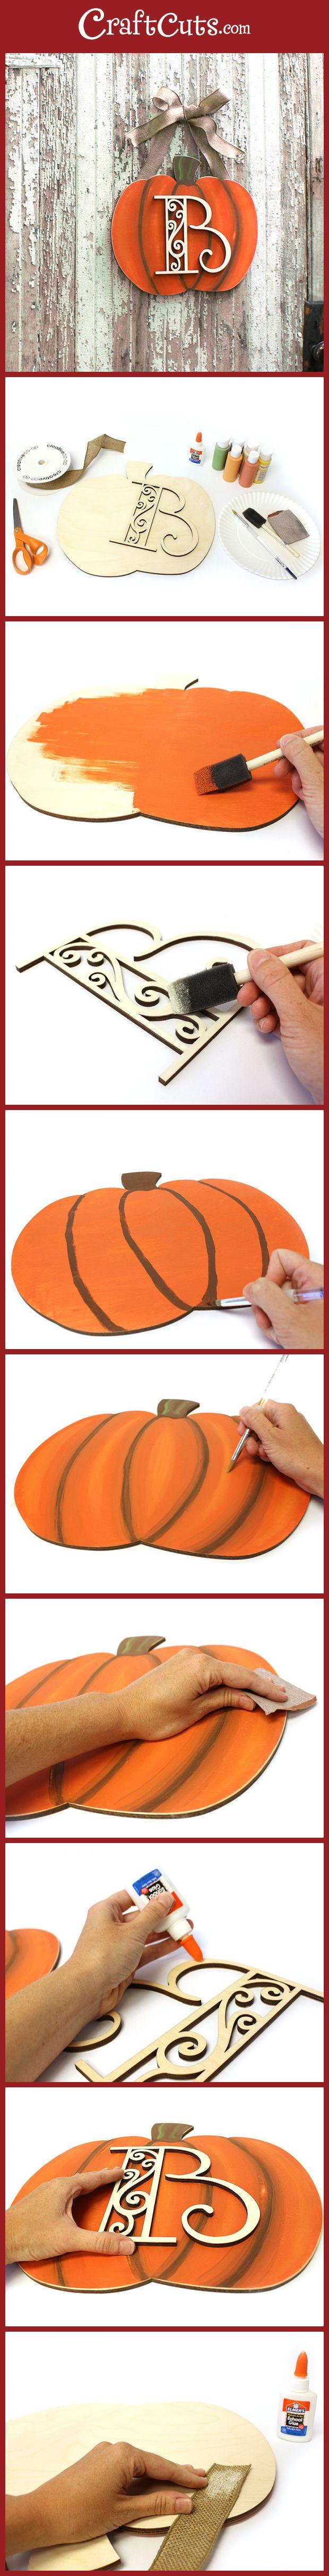 DIY Fall Decor - so cute and easy!